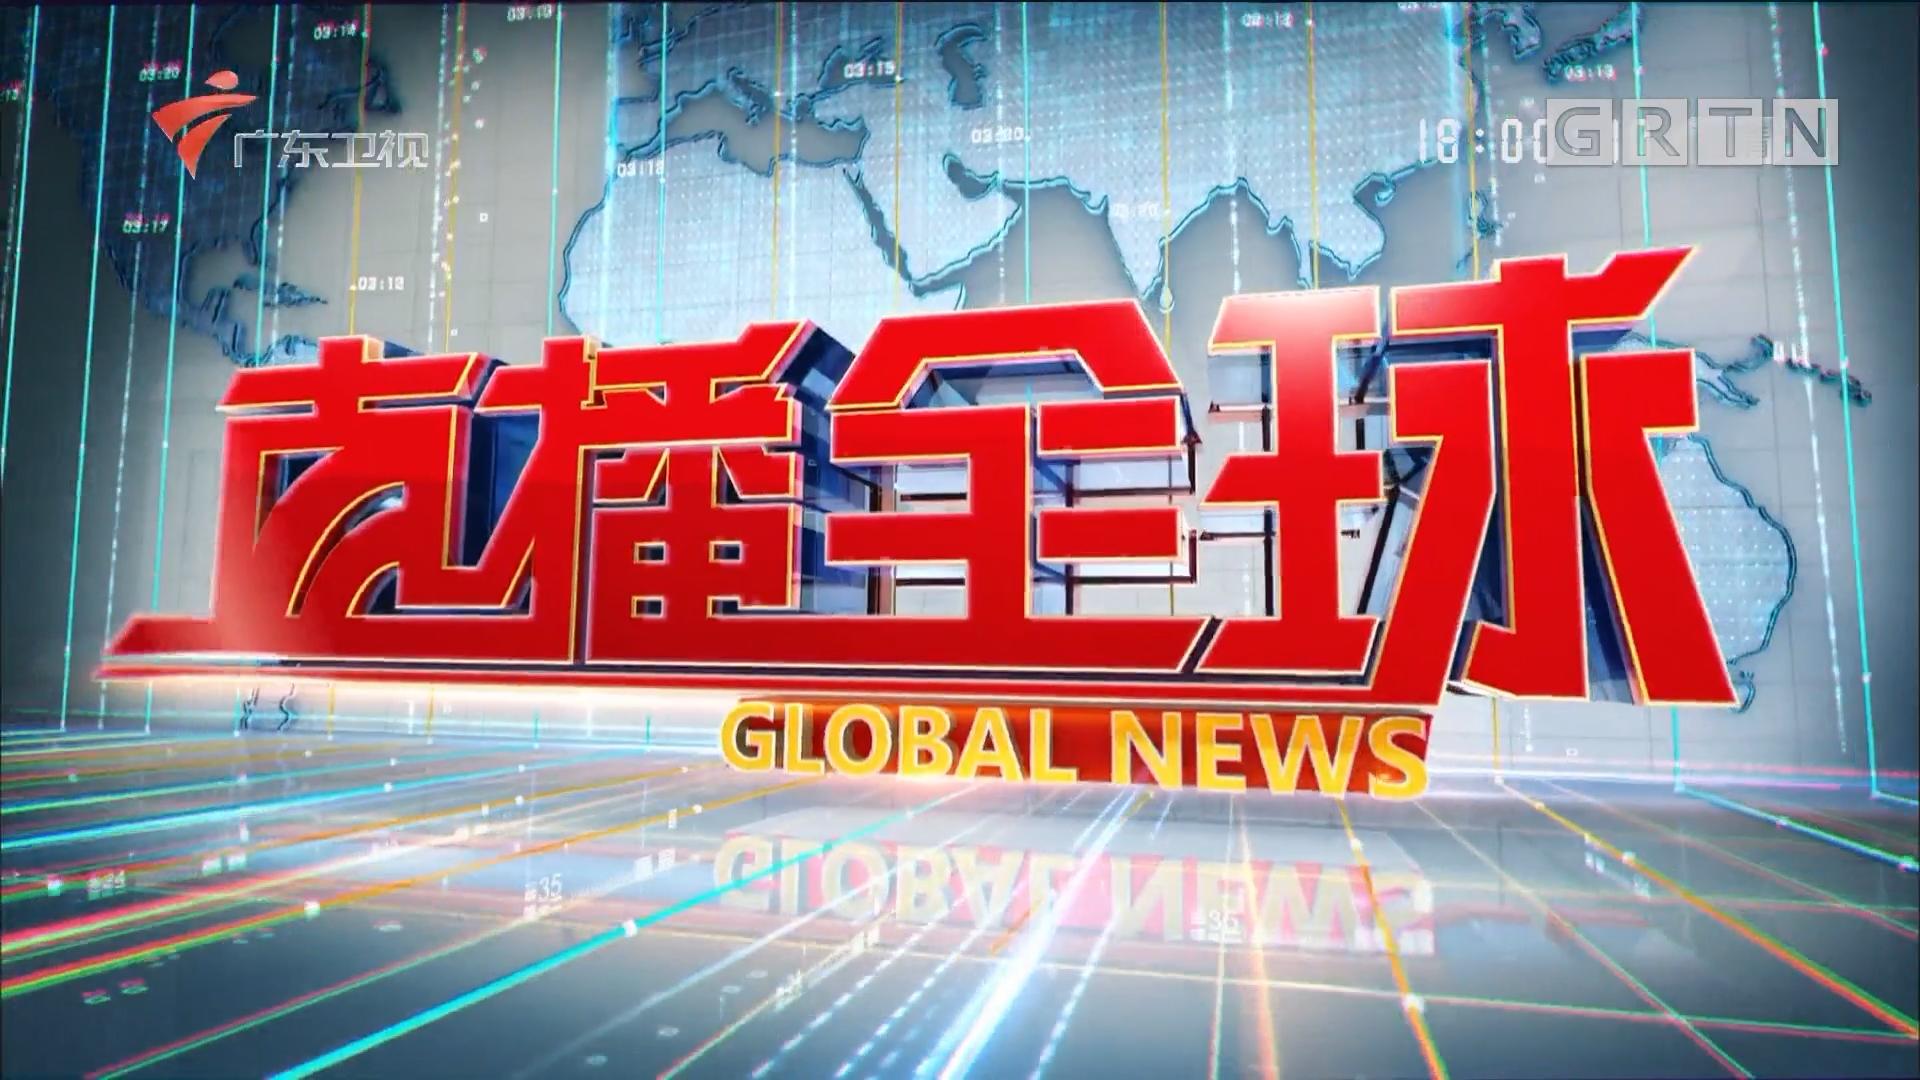 [HD][2018-03-12]直播全球:日本:愿为核查朝鲜买单 安倍晋三:朝核问题出现转机是日美的功劳